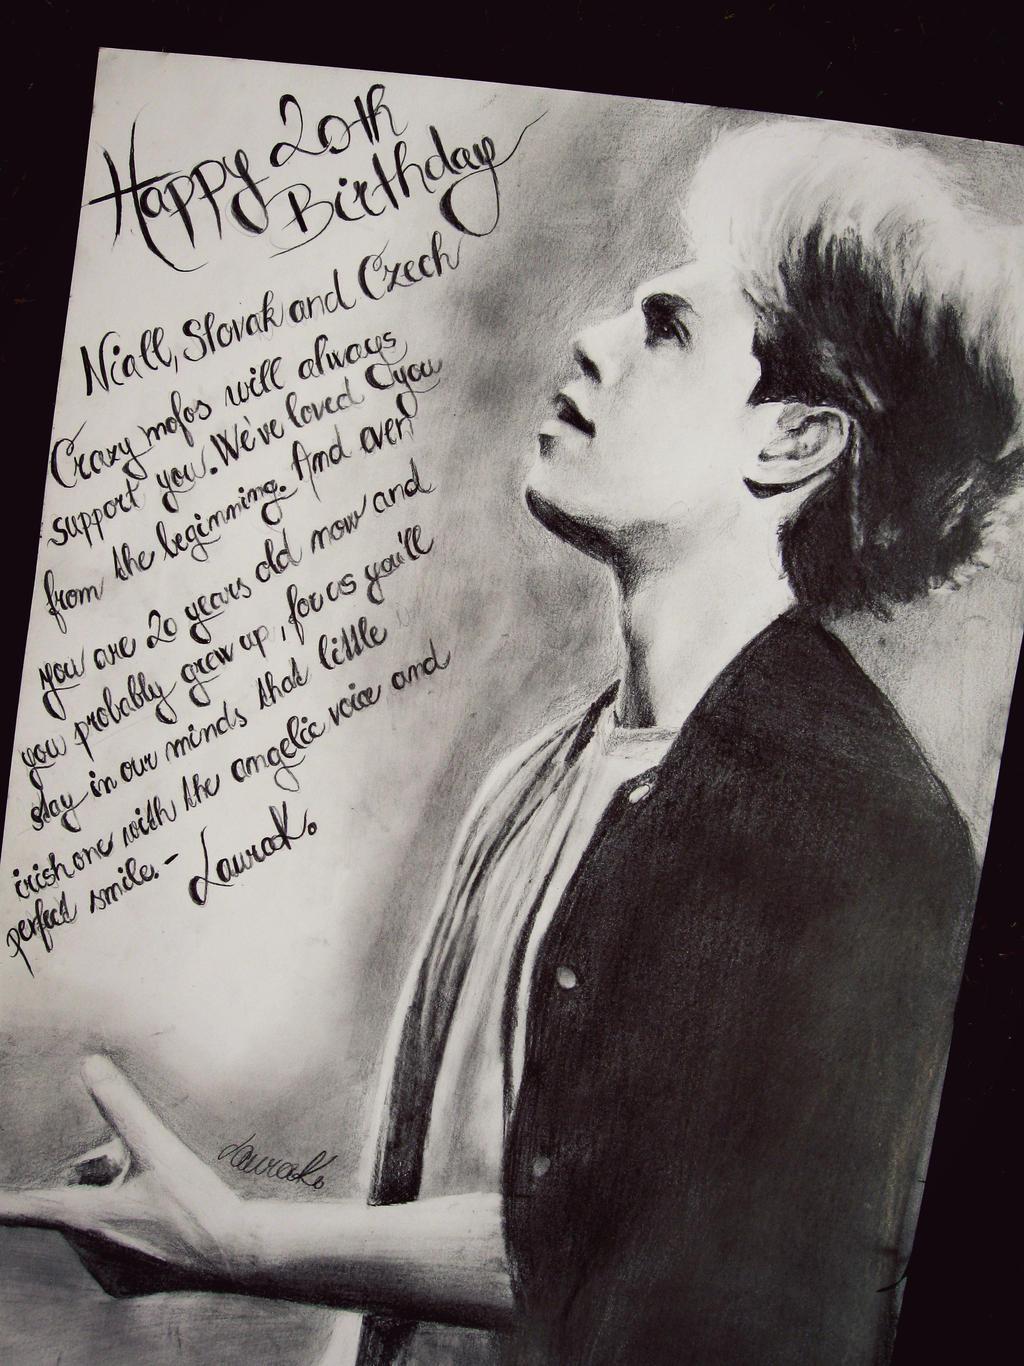 Niall horan drawing 2018